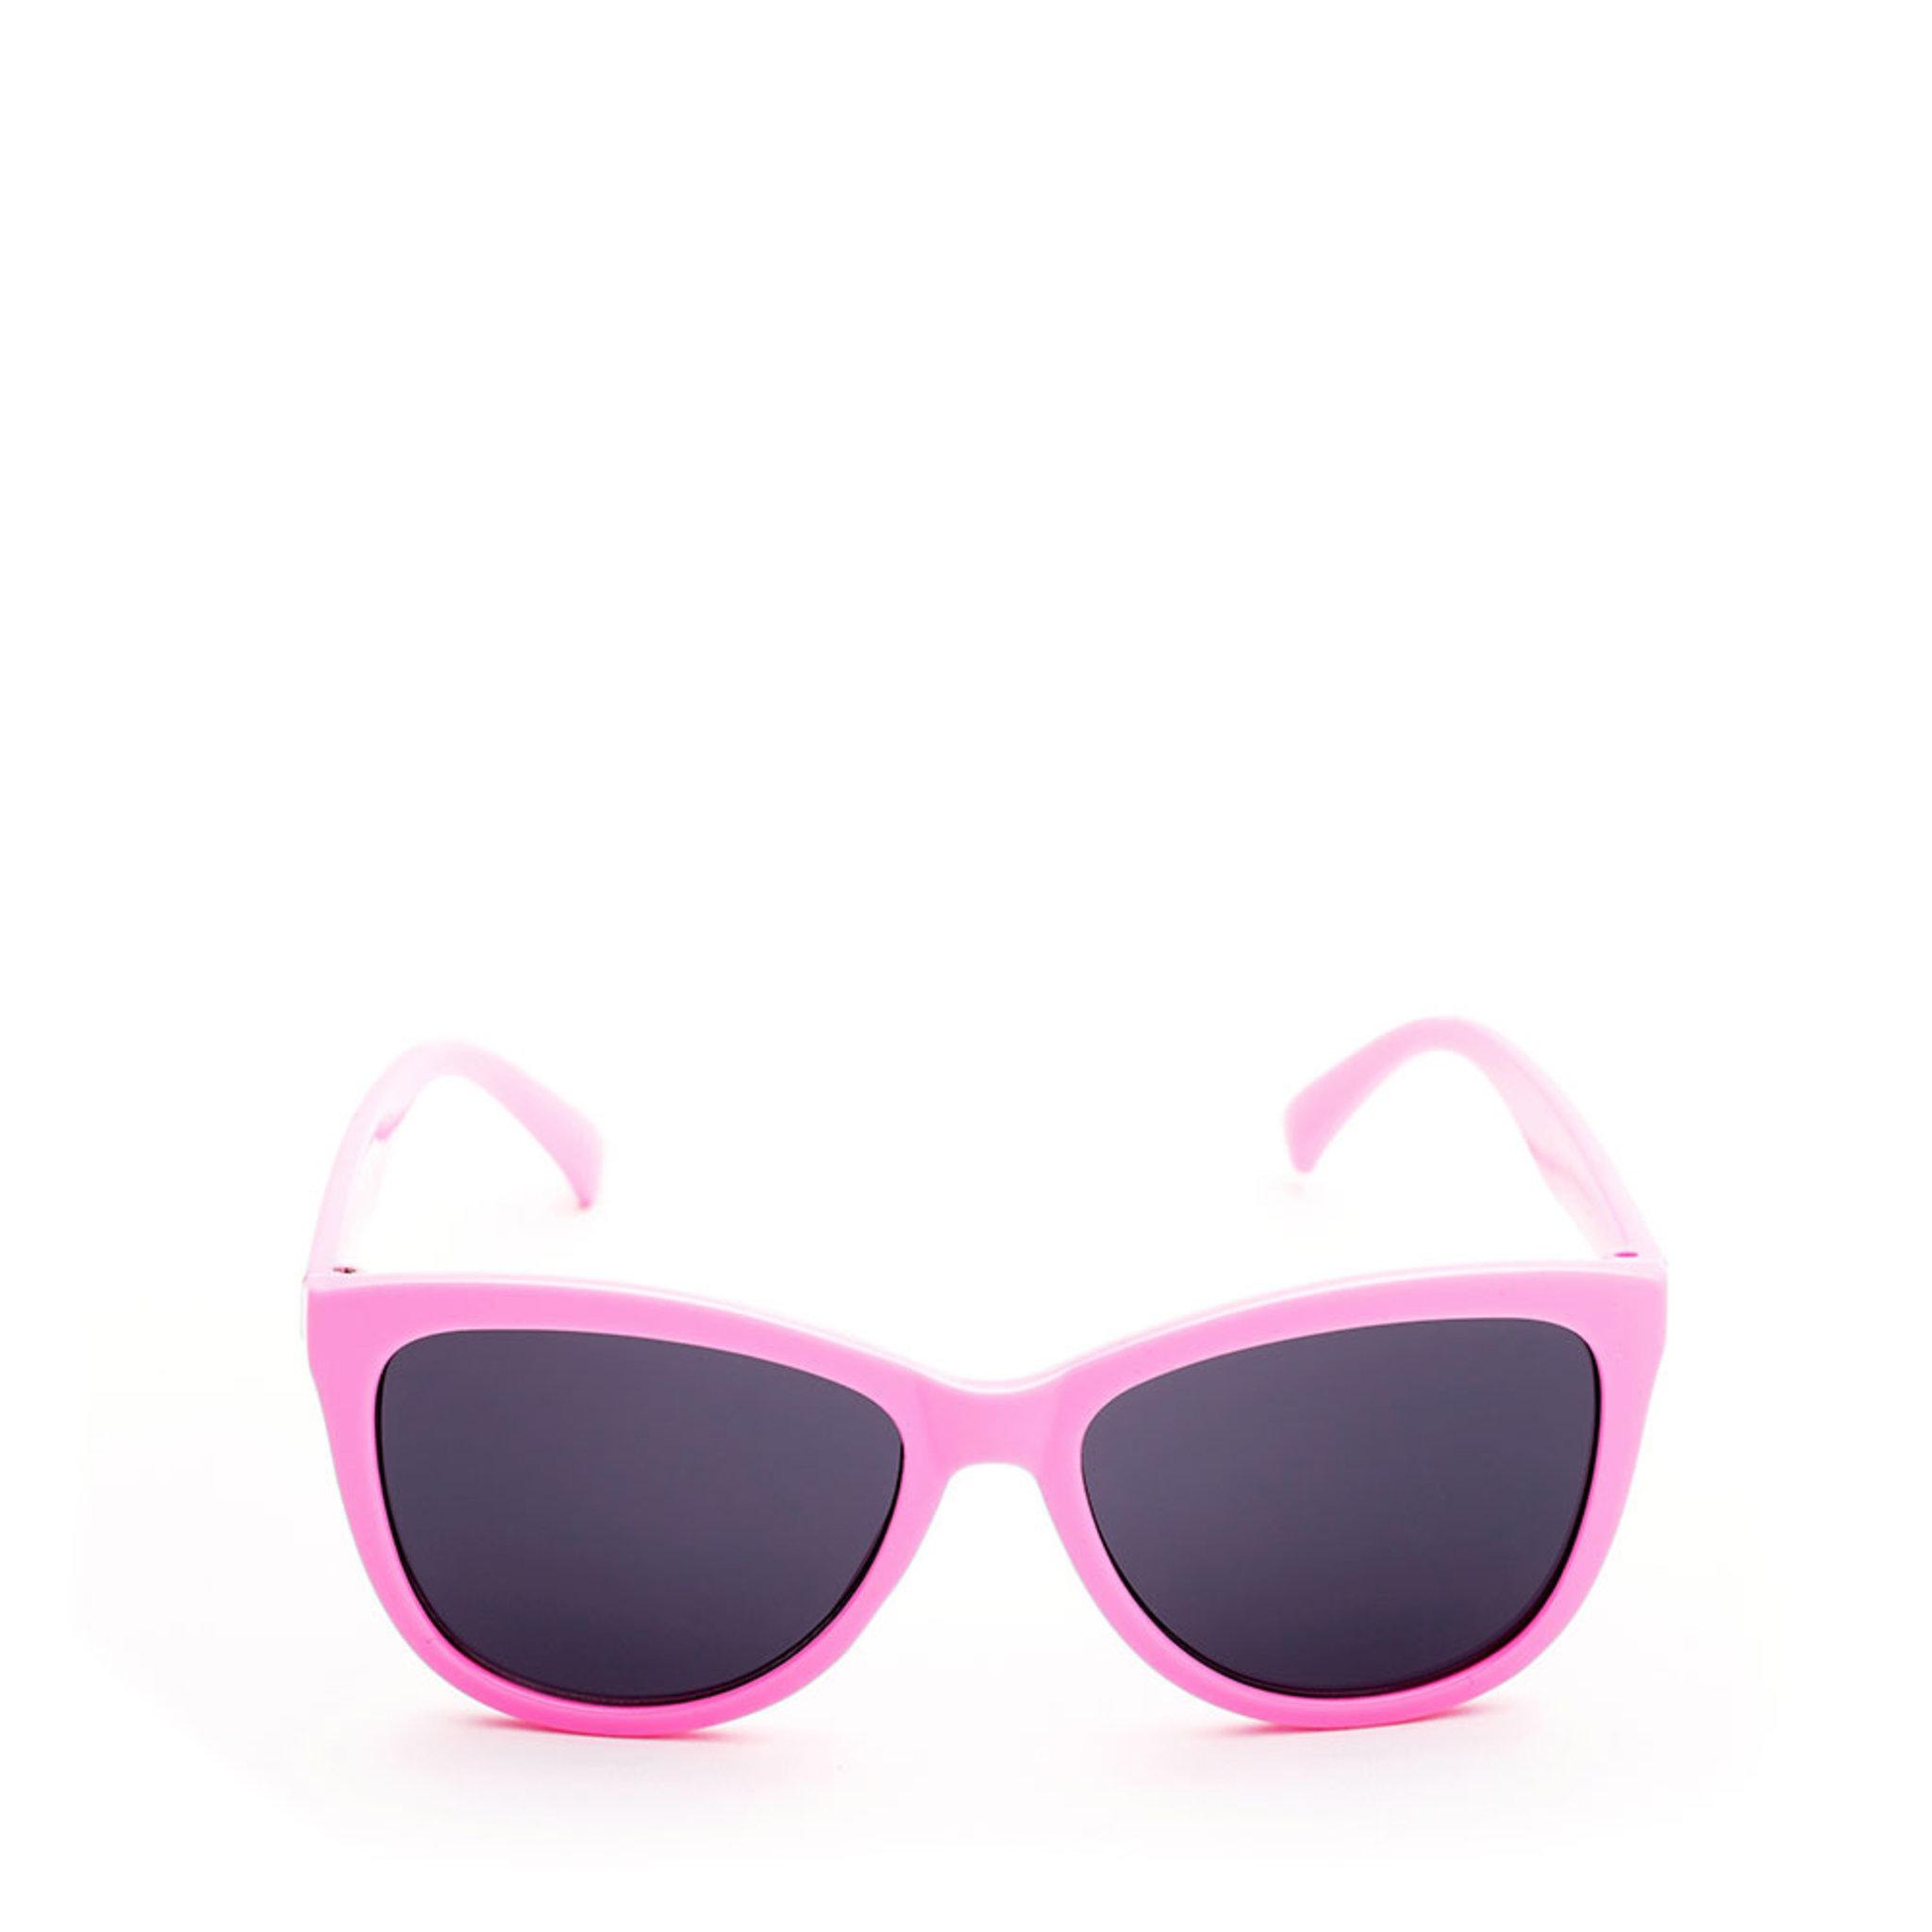 Doris barnsolglasögon